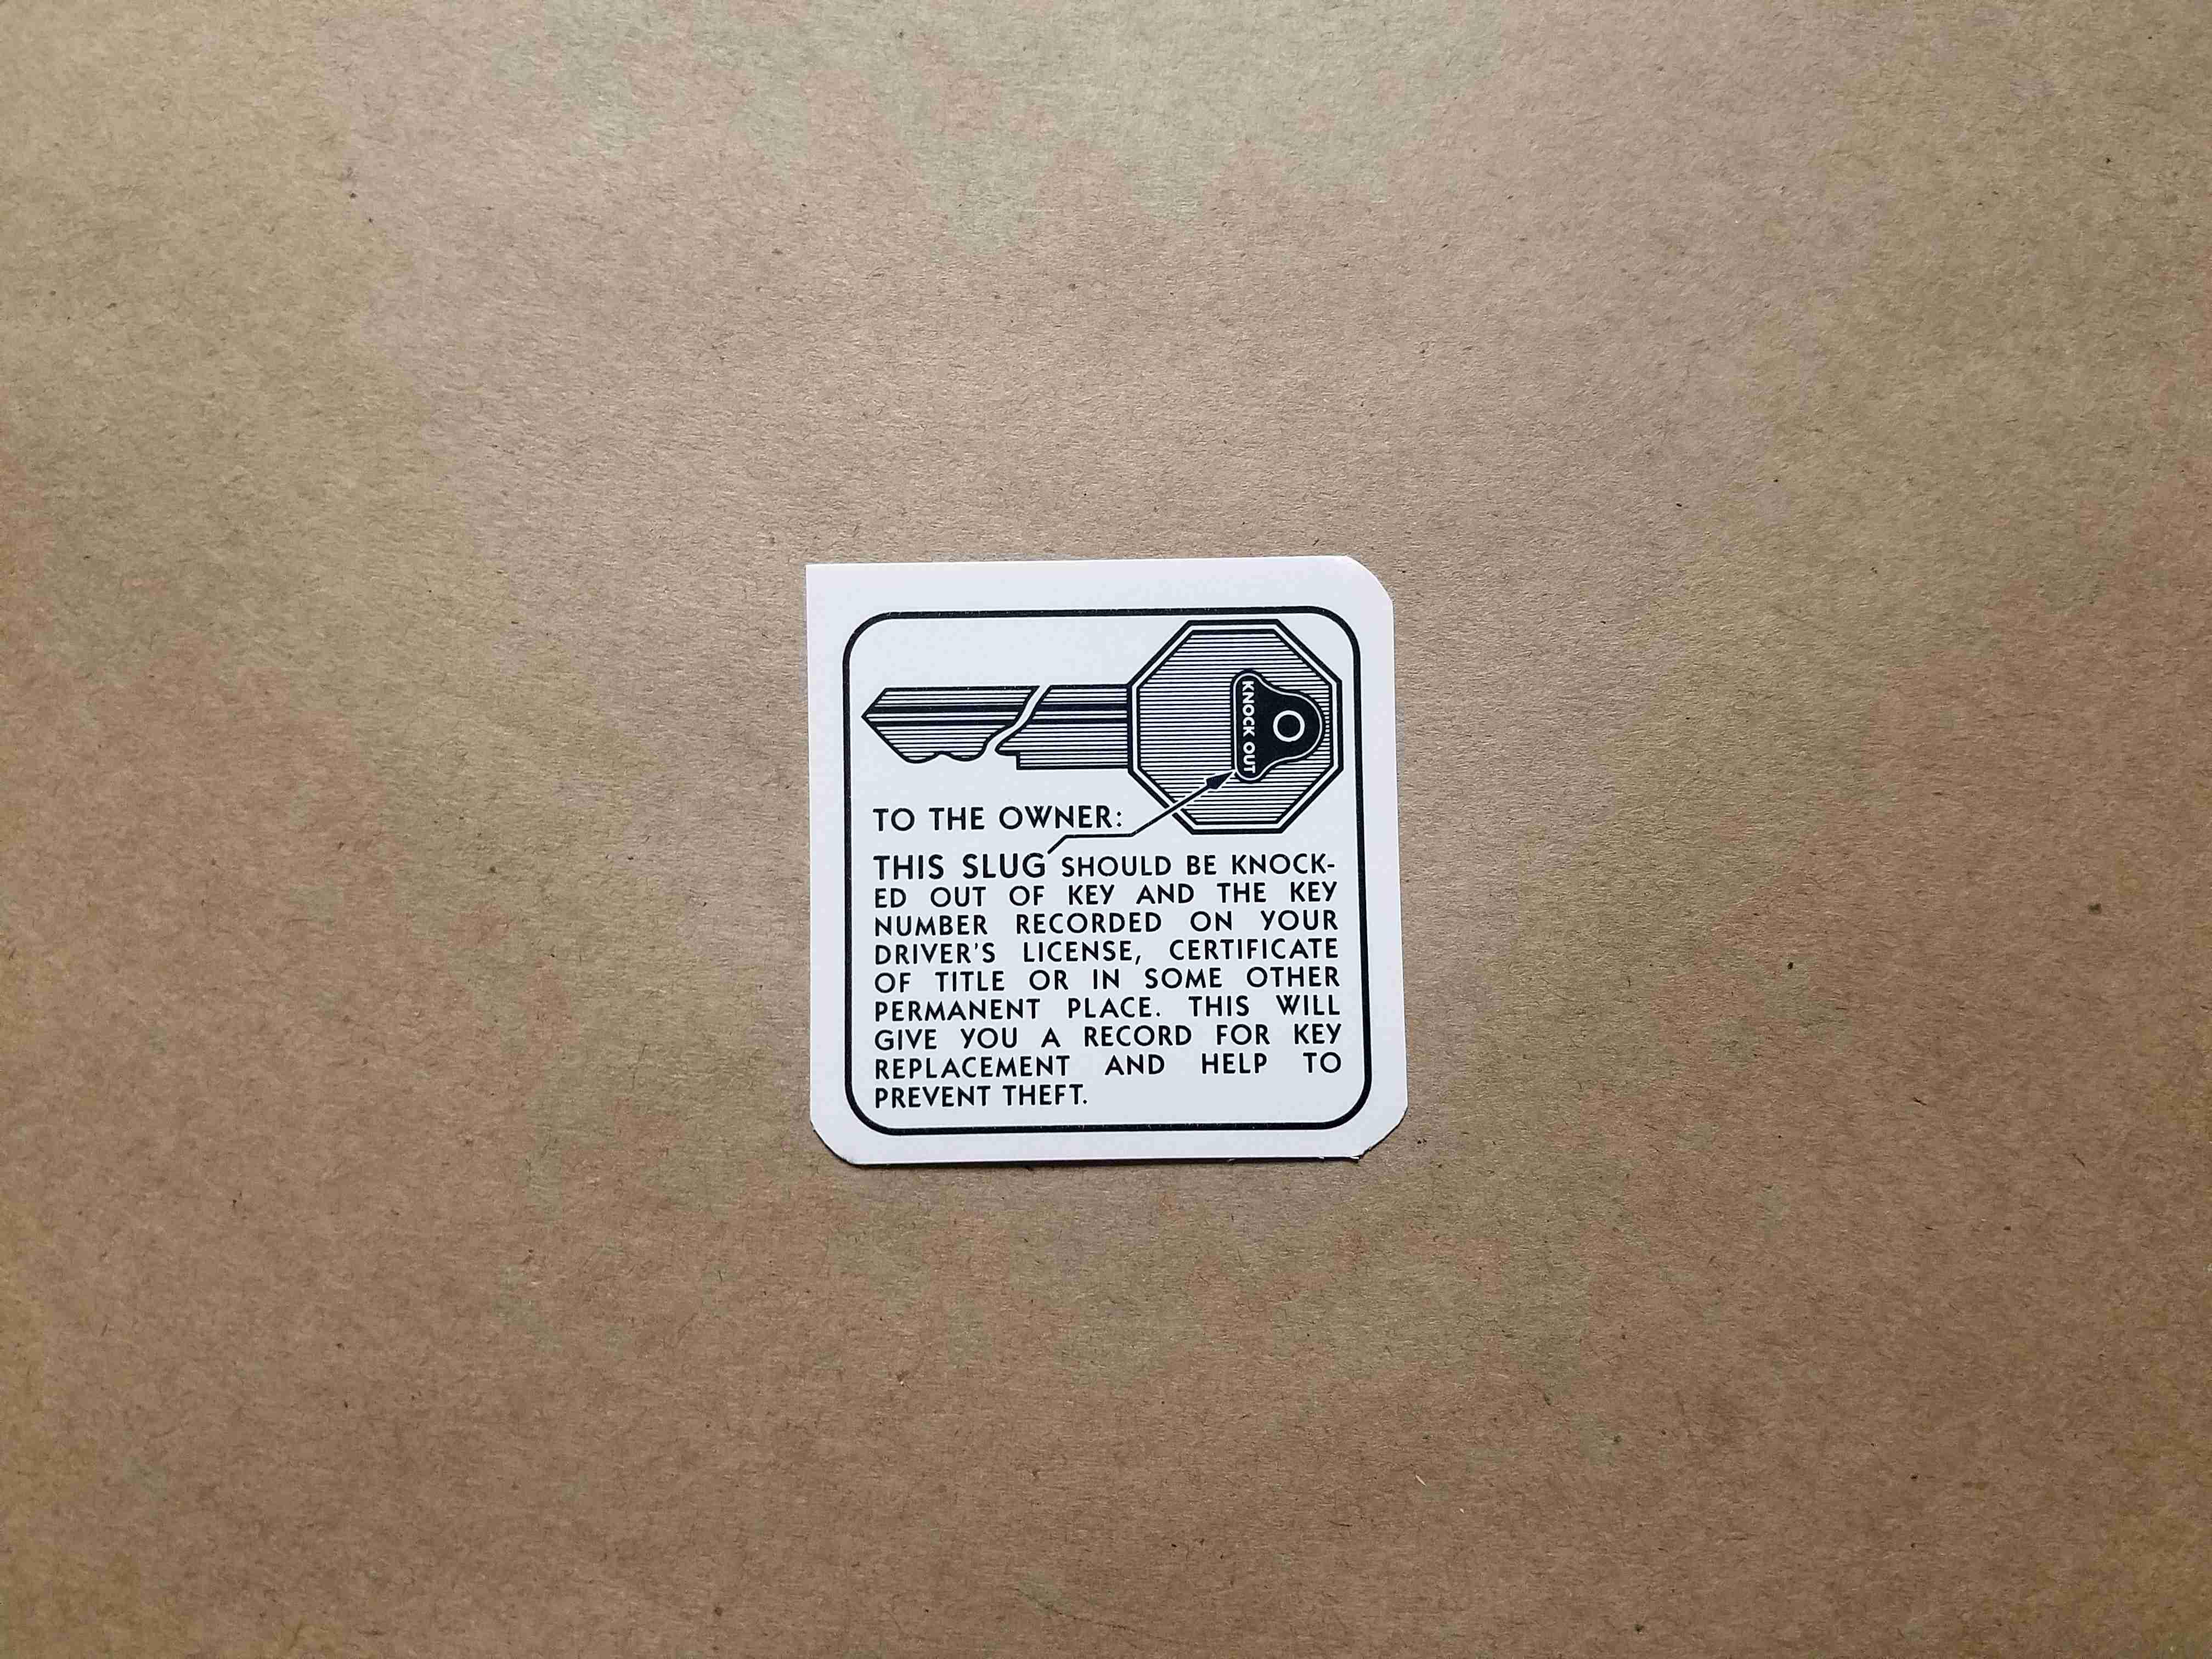 1936-58 Glove Box Key Instruction Decal